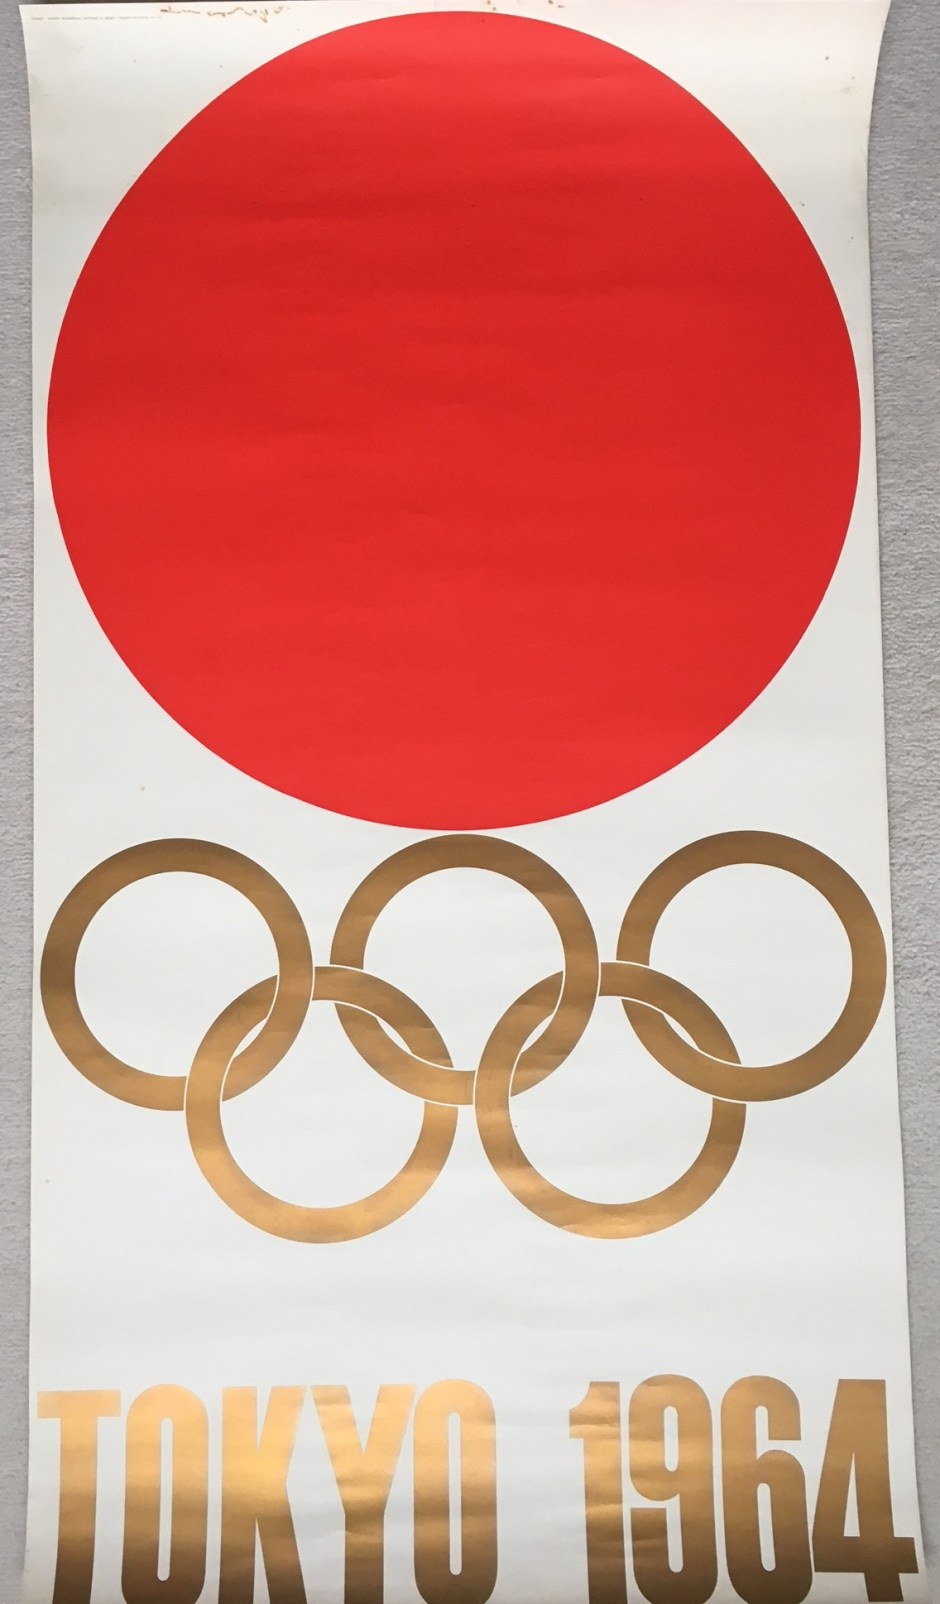 My Kamekura Yusaku original 1964 Poster